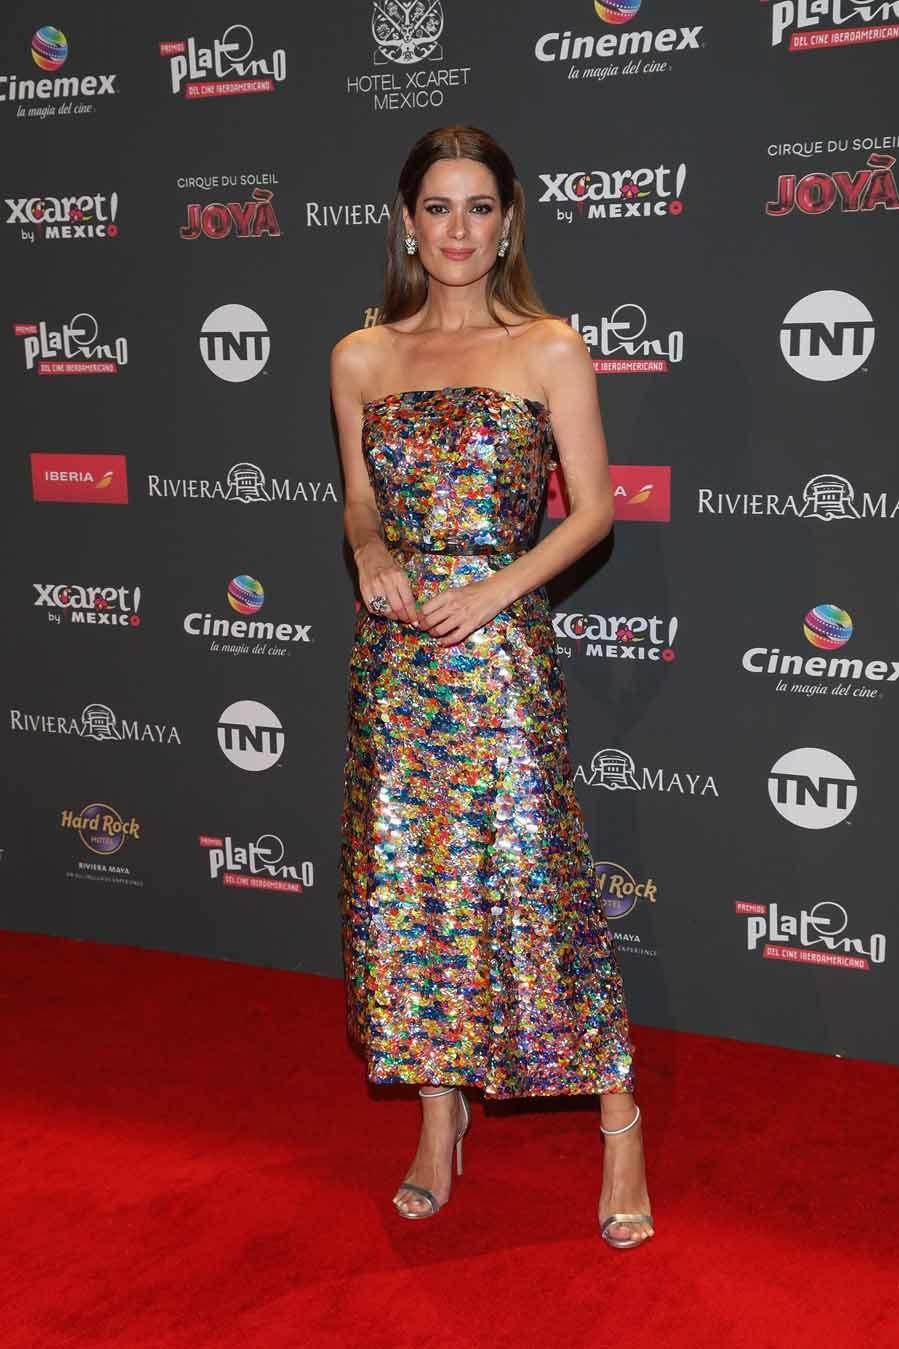 Mar Saura Premios Platino 2019 | Moda | EL MUNDO